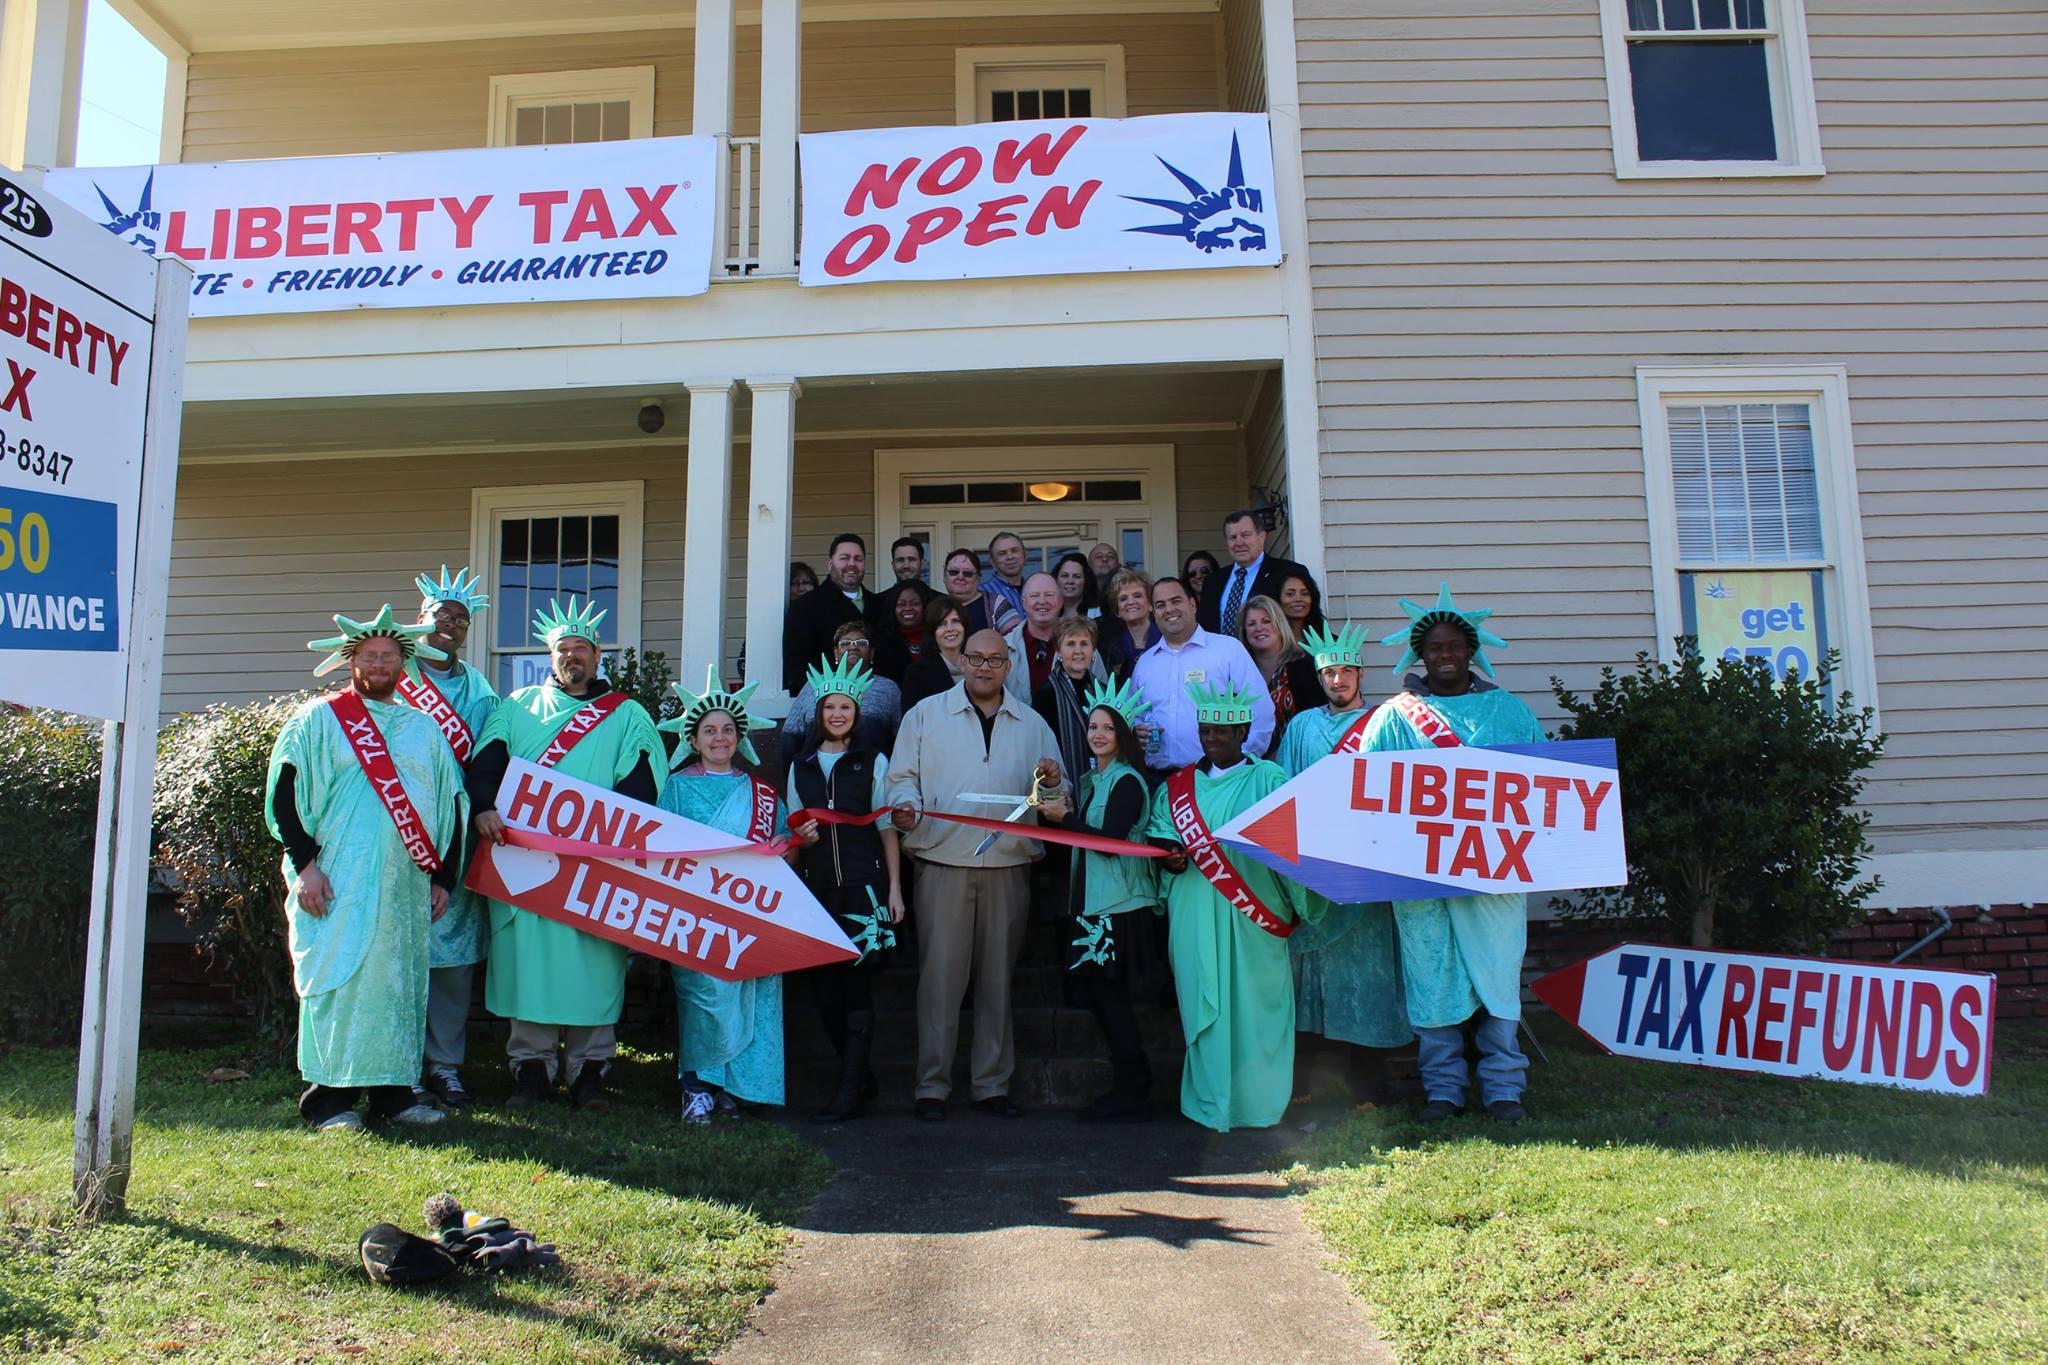 liberty tax.jpg